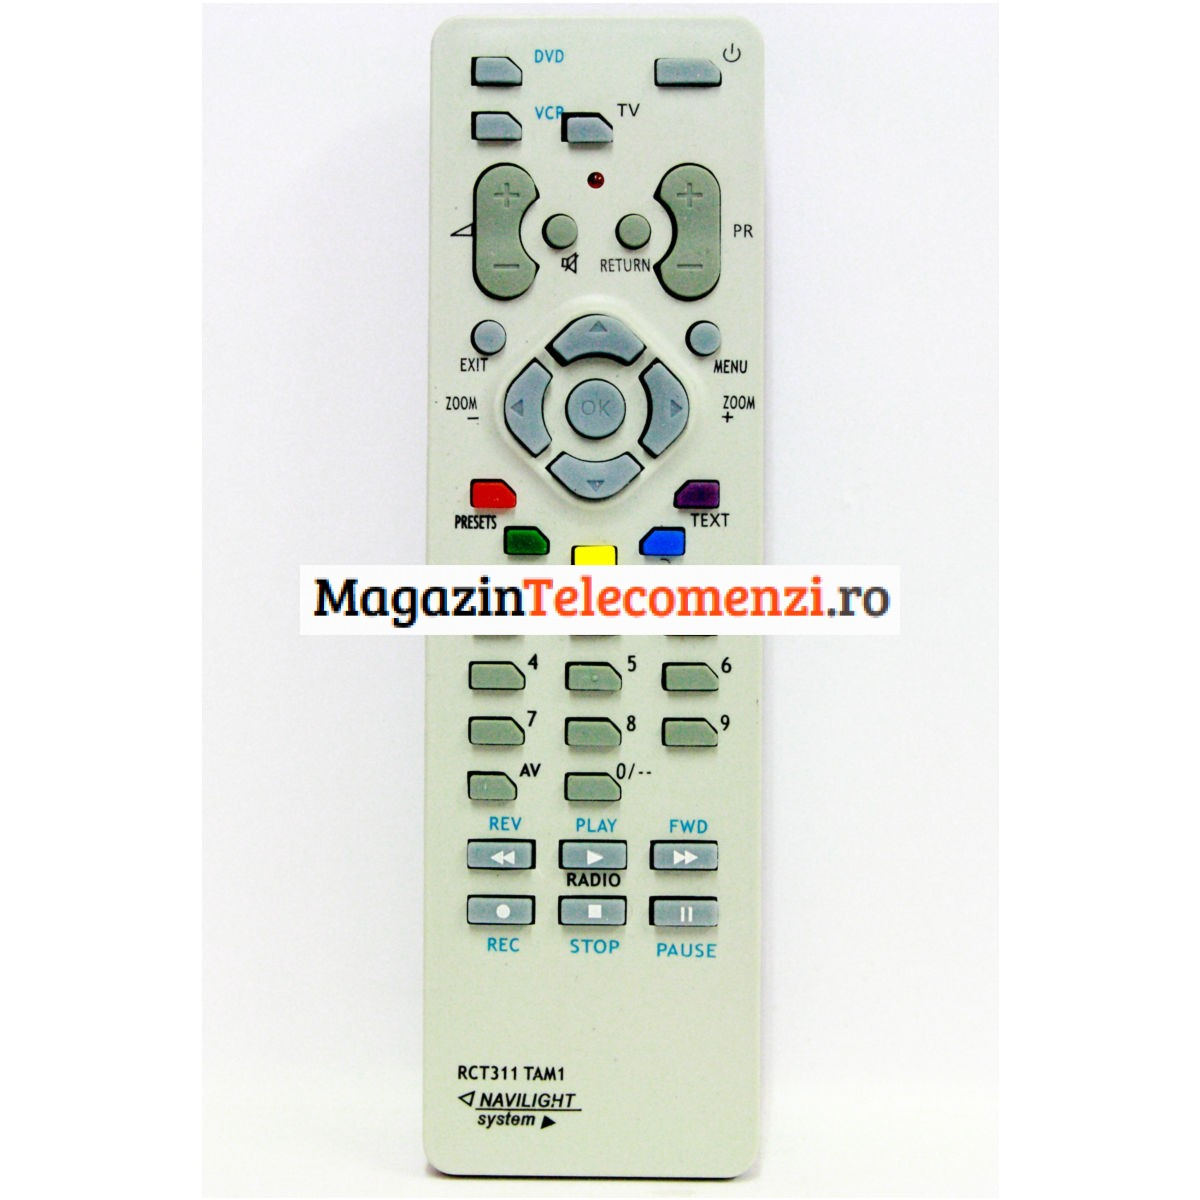 Telecomanda THOMSON RCT 311